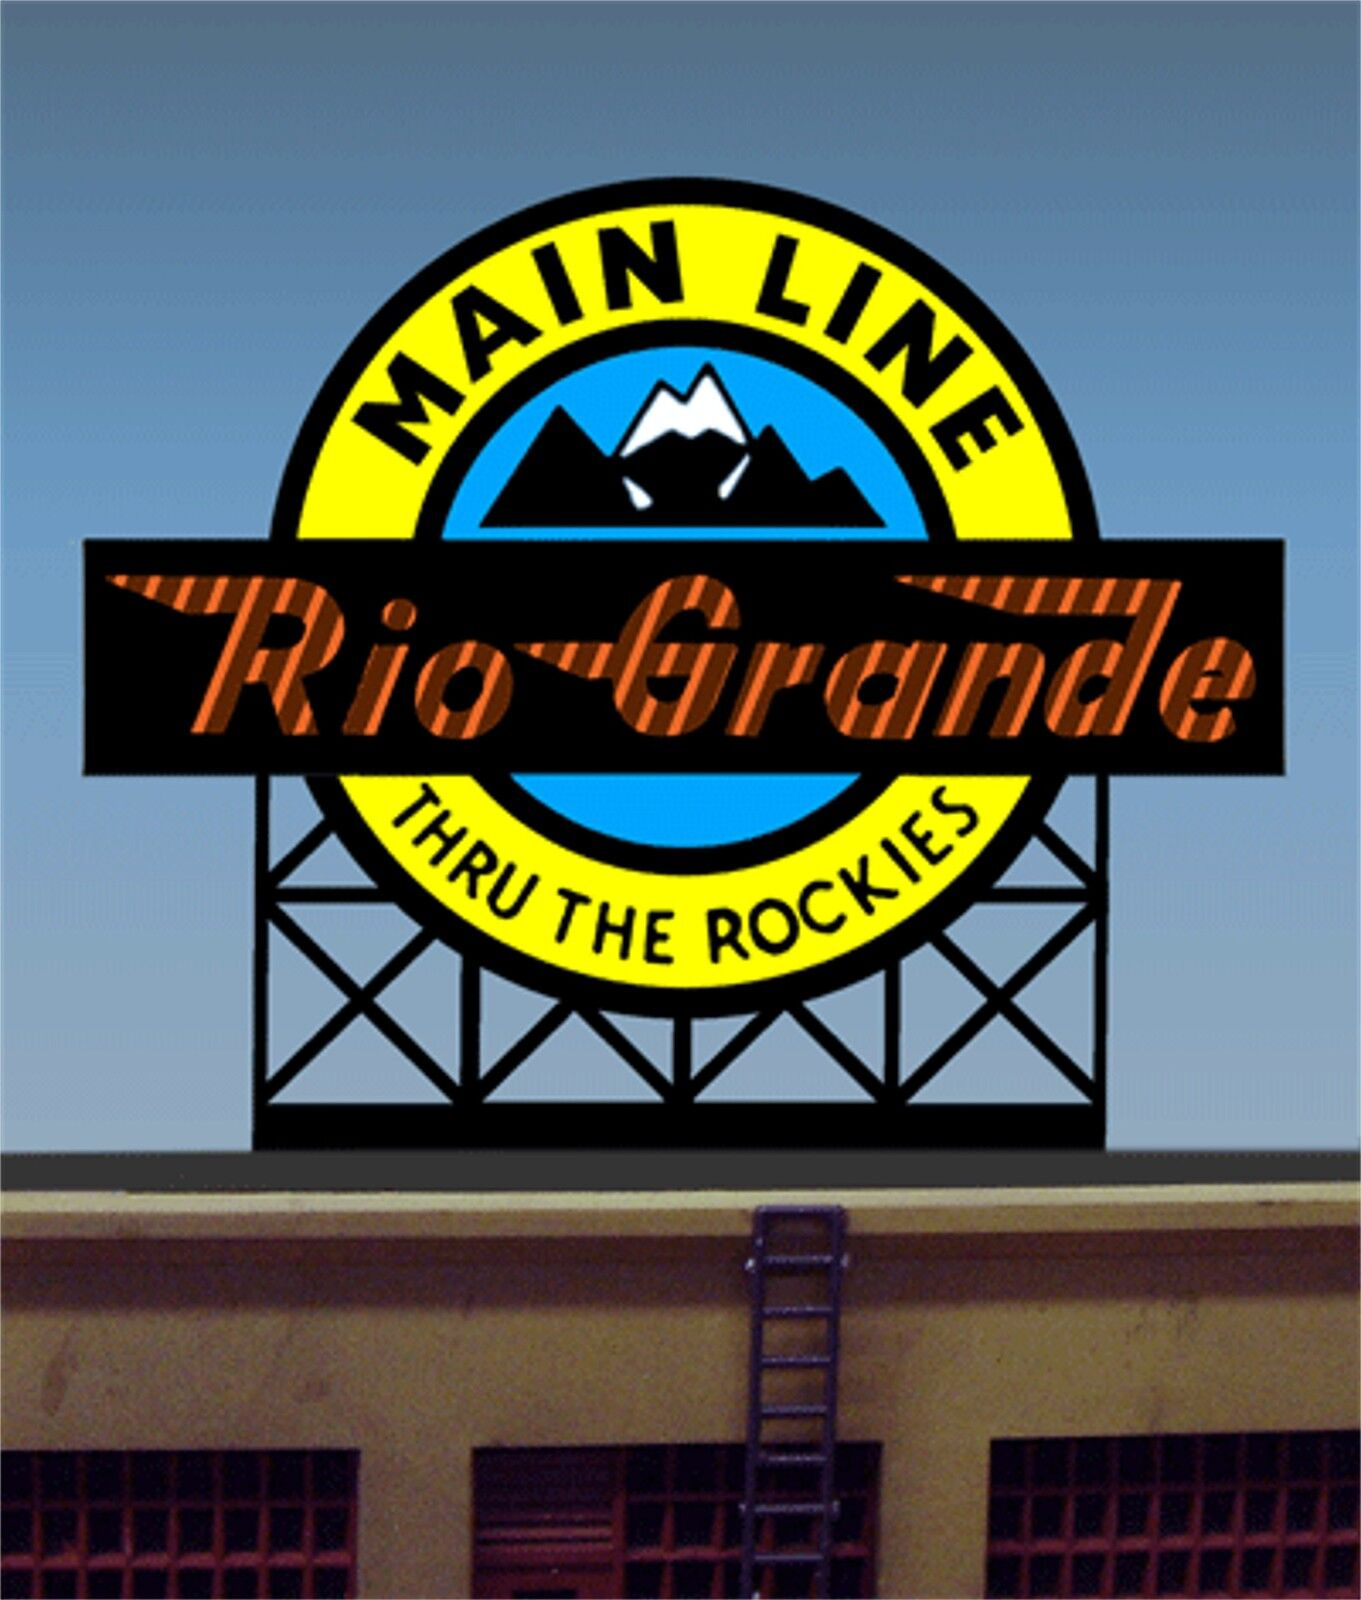 Miller's Rio Grande Billboard Animated Neon Sign O HO 88-0601 MILLER ENGINEERING